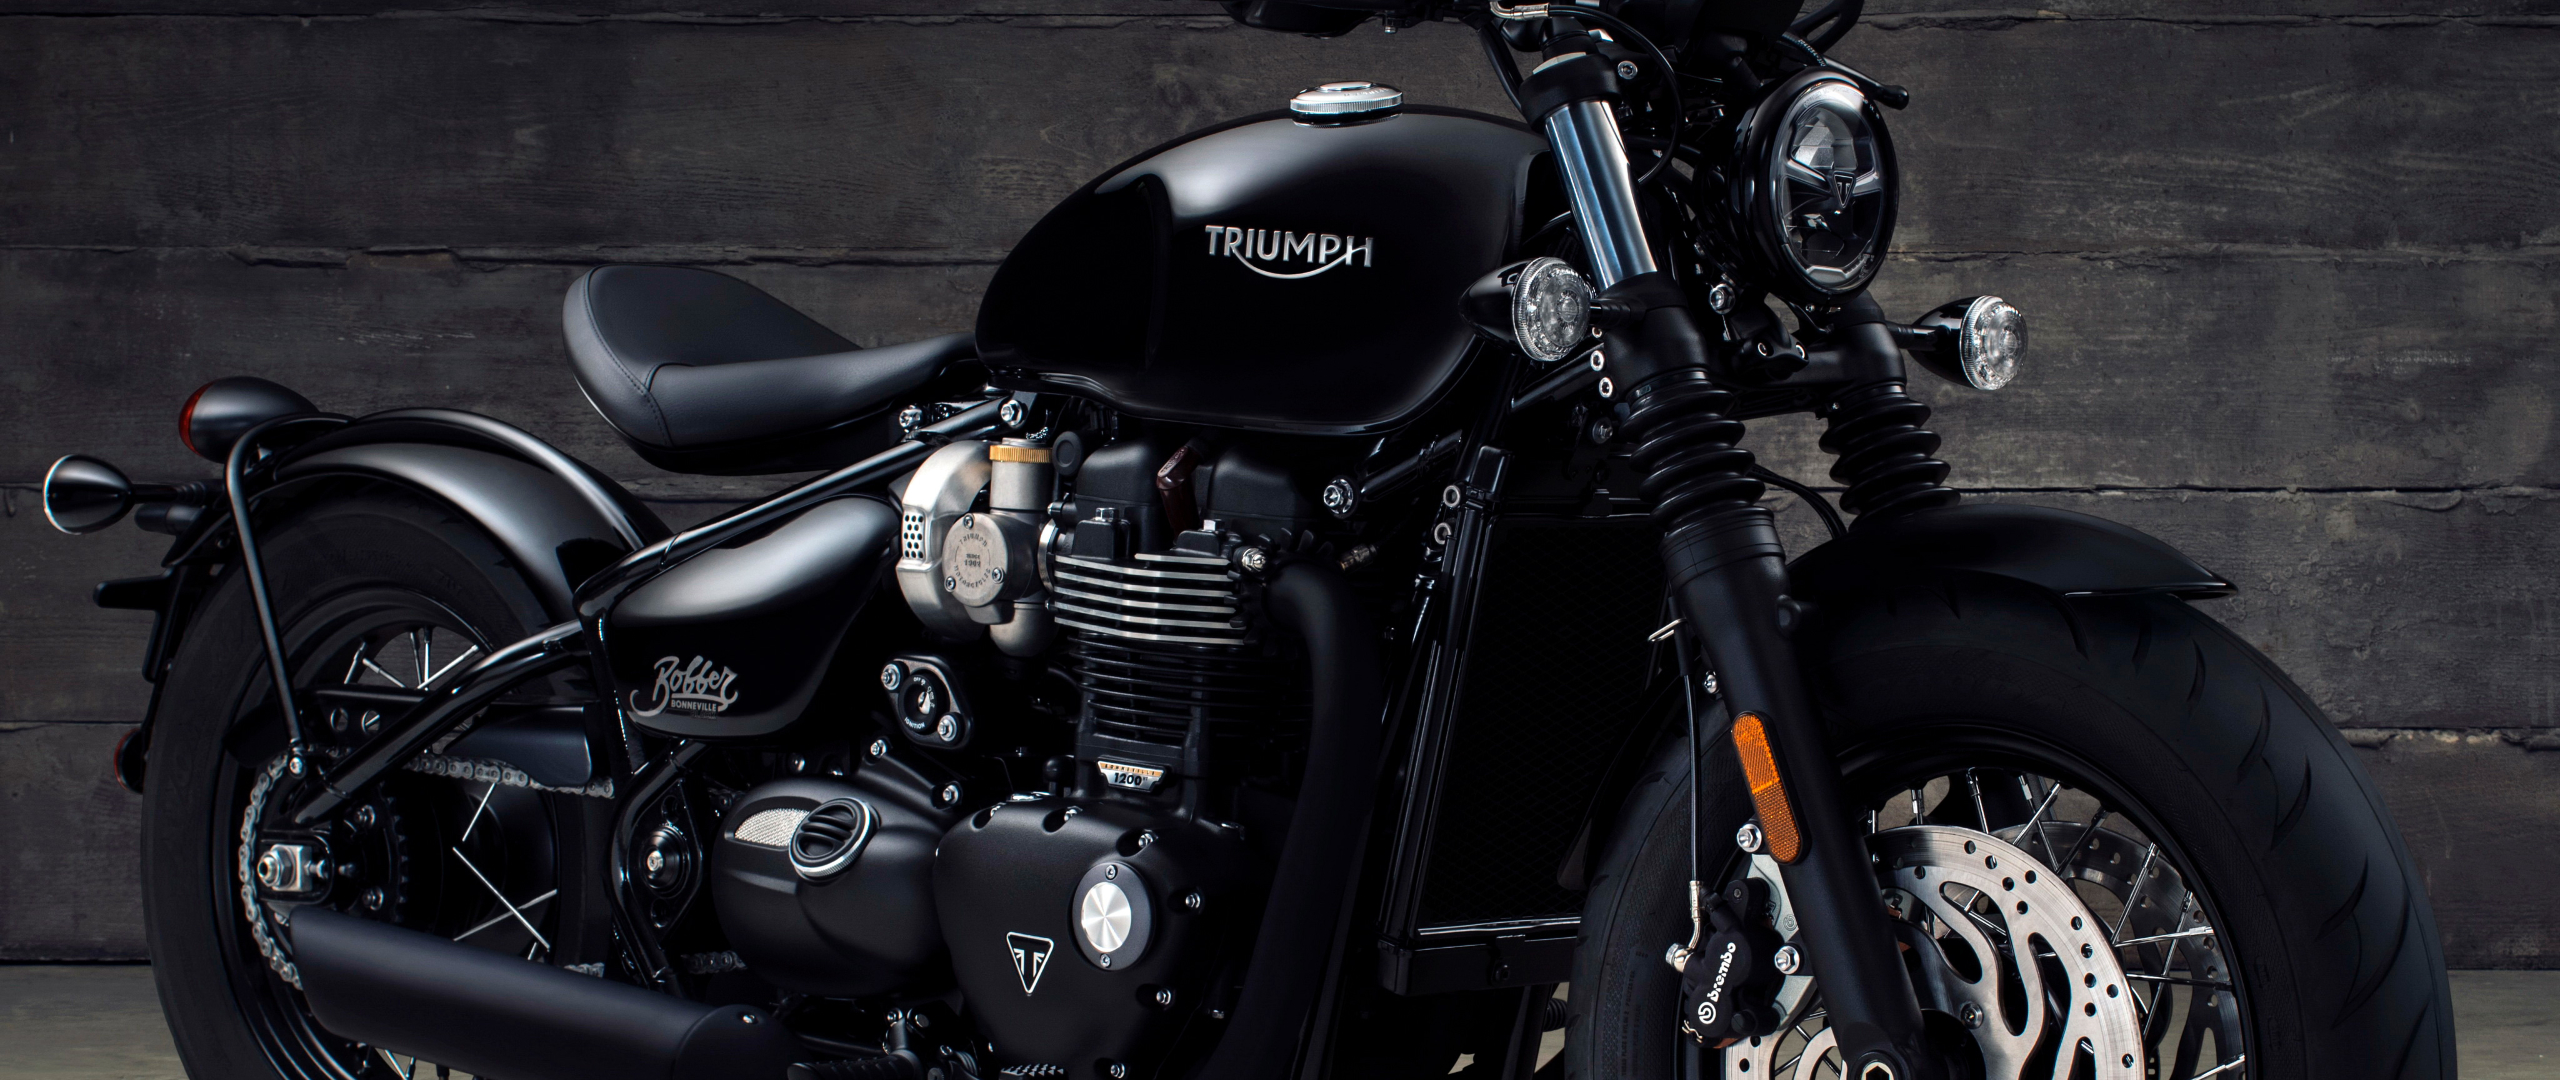 Triumph Bonneville Bobber Black 2017, HD 4K Wallpaper